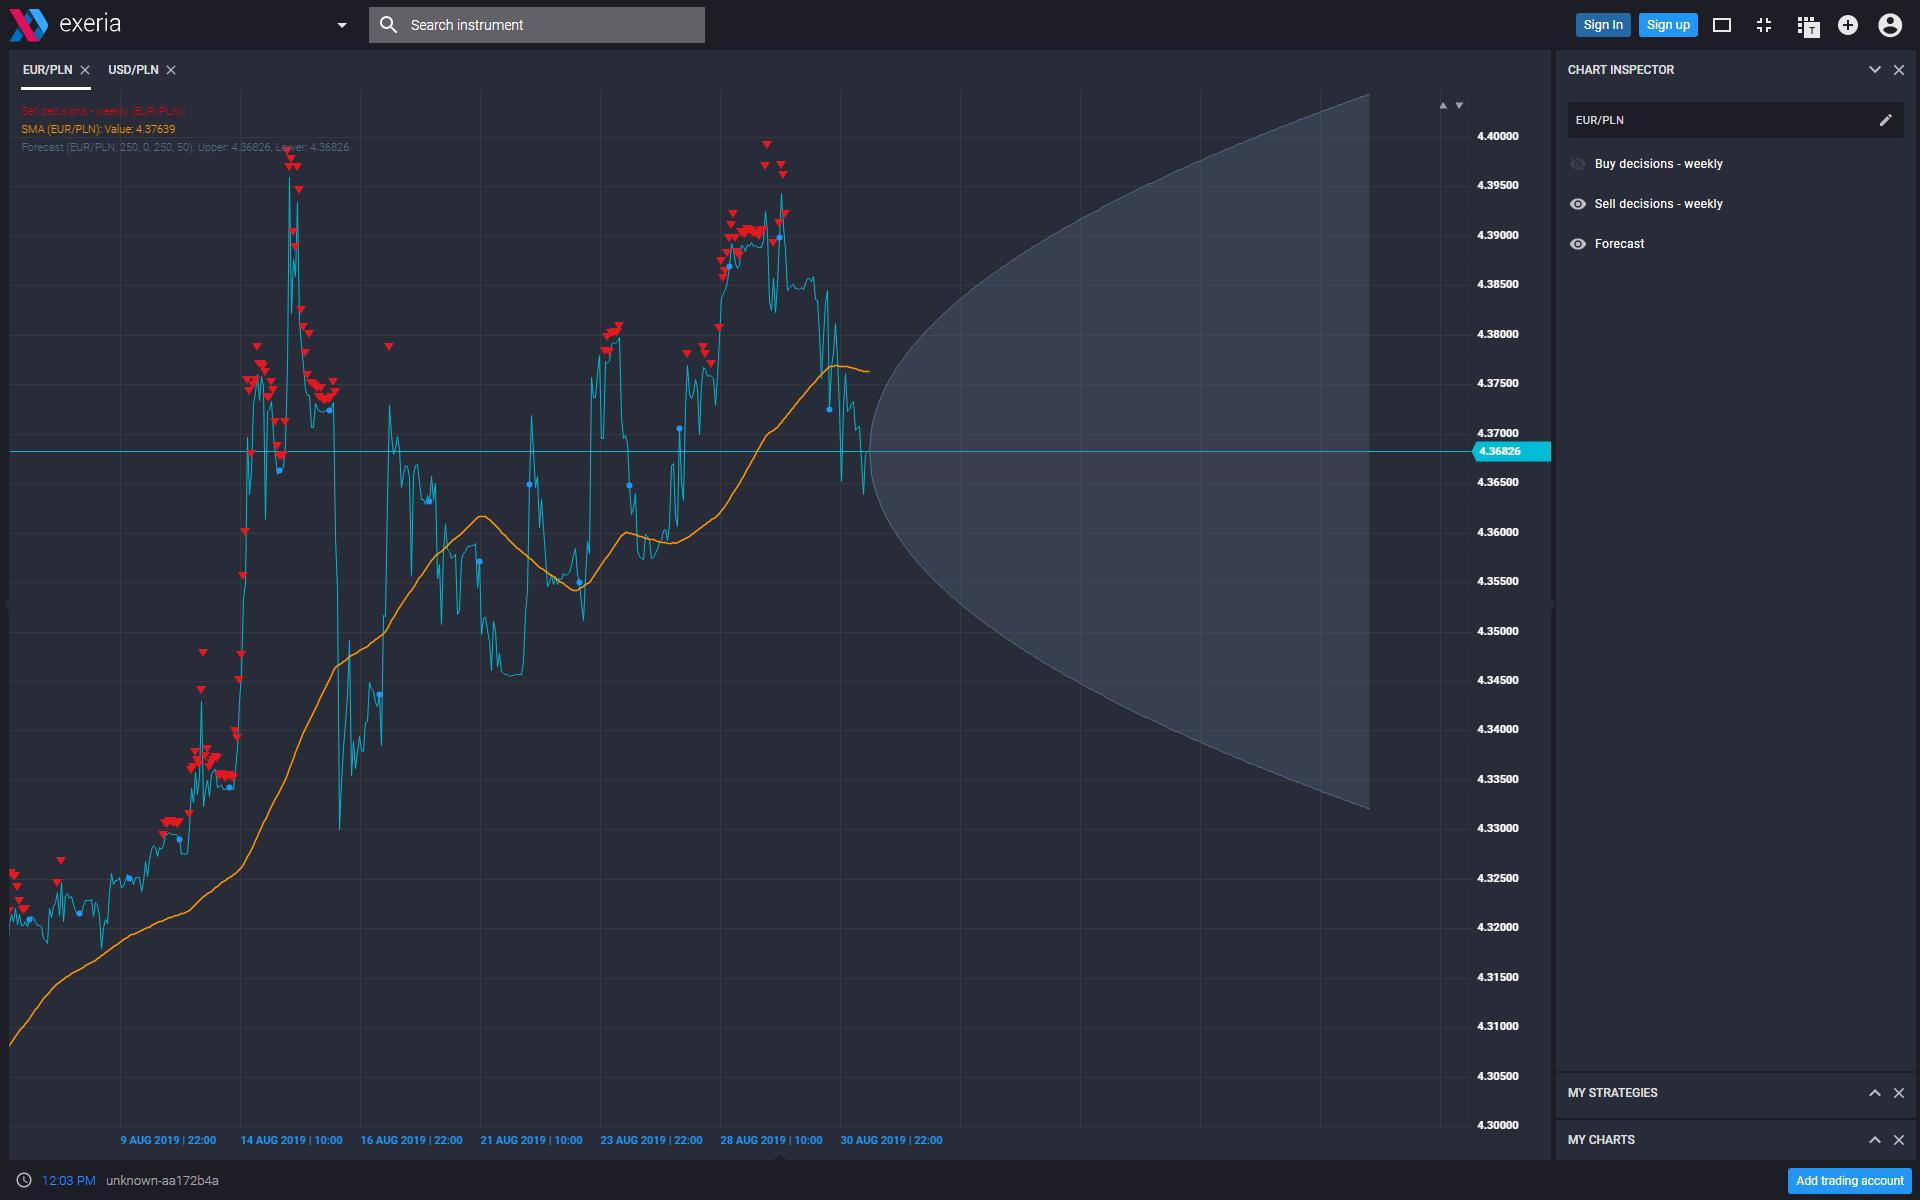 prognozowanie cen, FX predictor, platforma Exeria